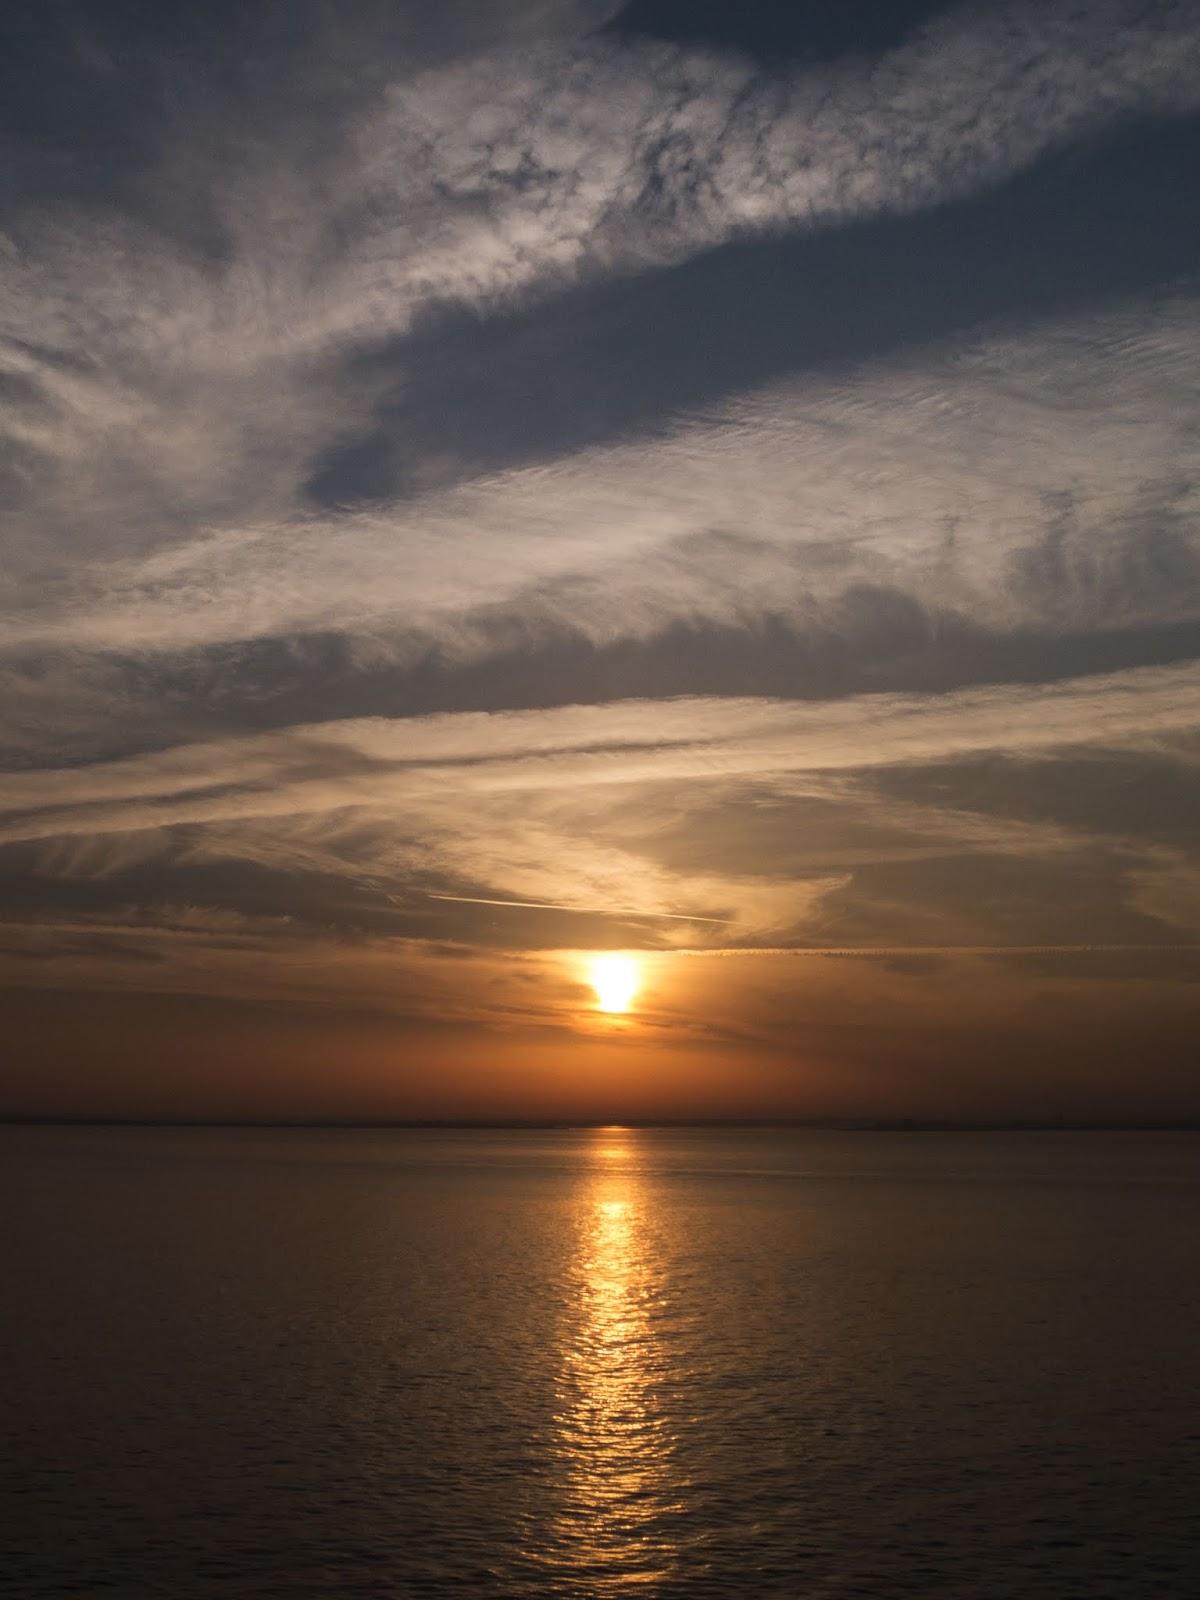 Sun risen above the horizon casting a reflection across water in Lisbon.